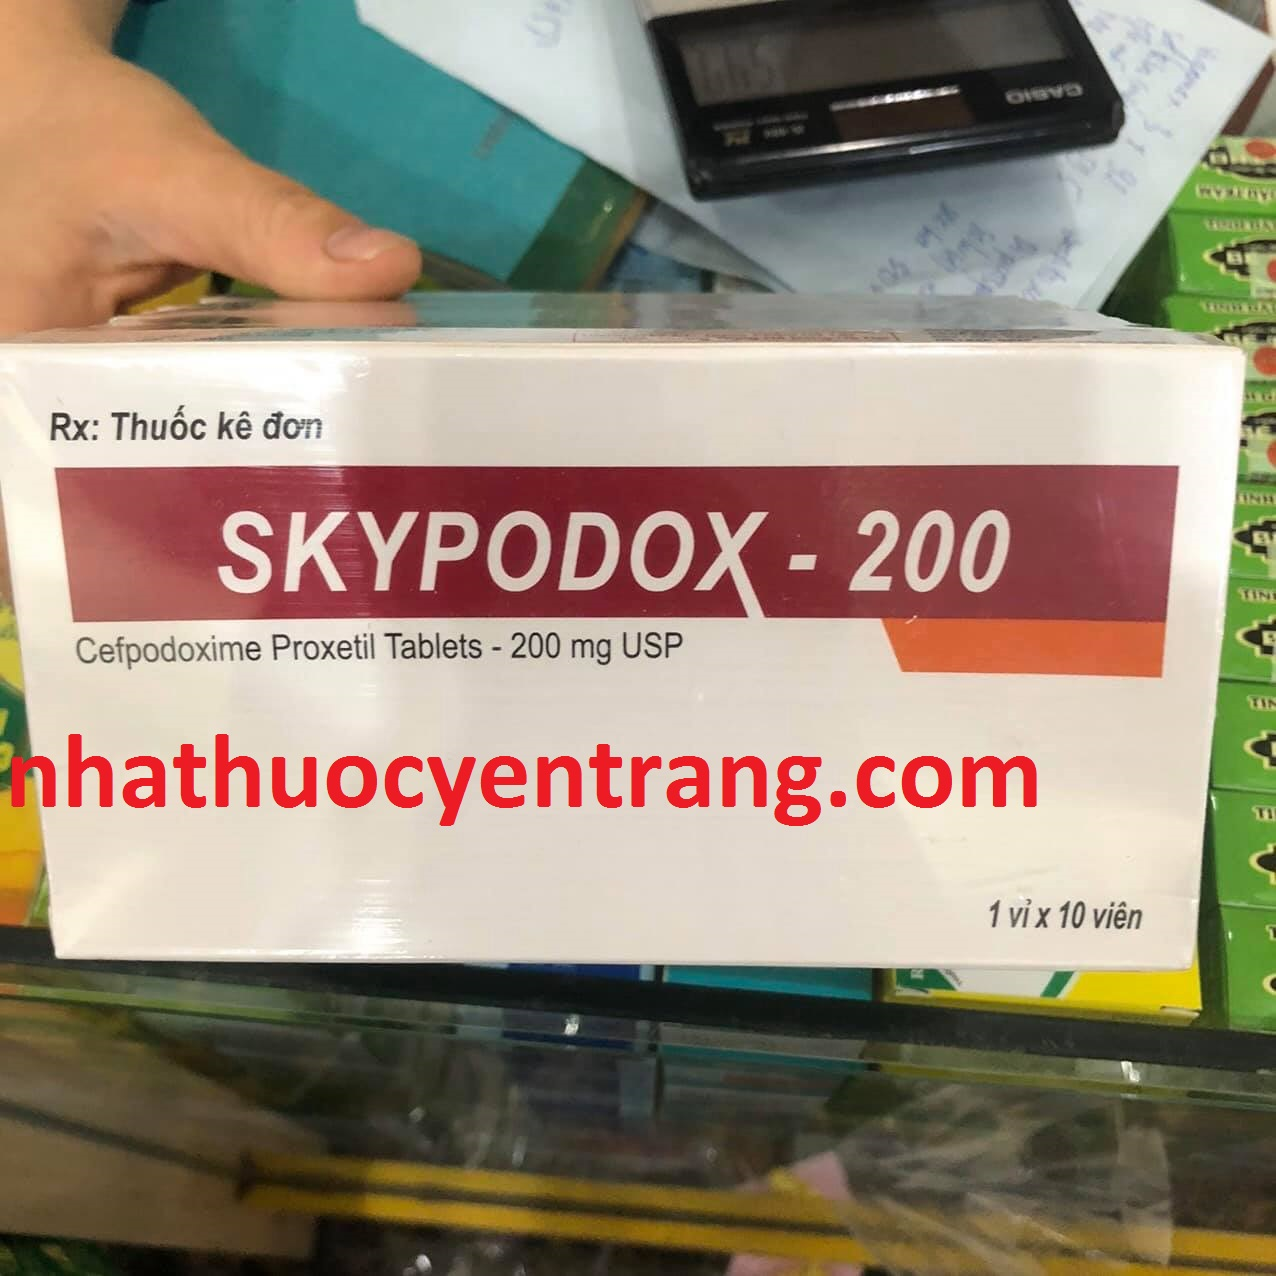 Skypodox 200mg